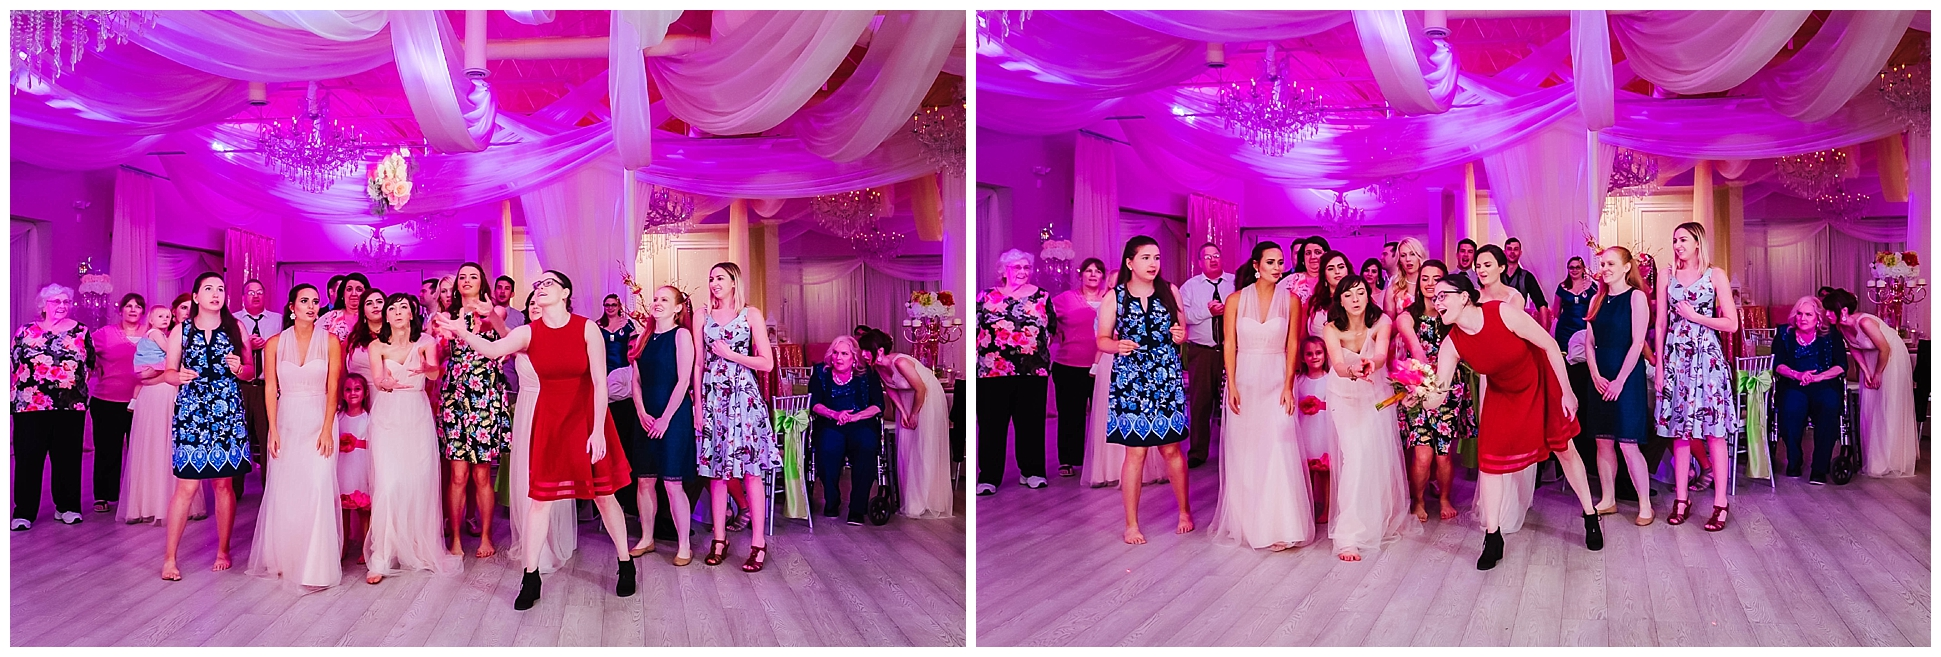 st-pete-wedding-photographer-sunken-gardens-crystal-ballroom-princess-dancer_0203.jpg